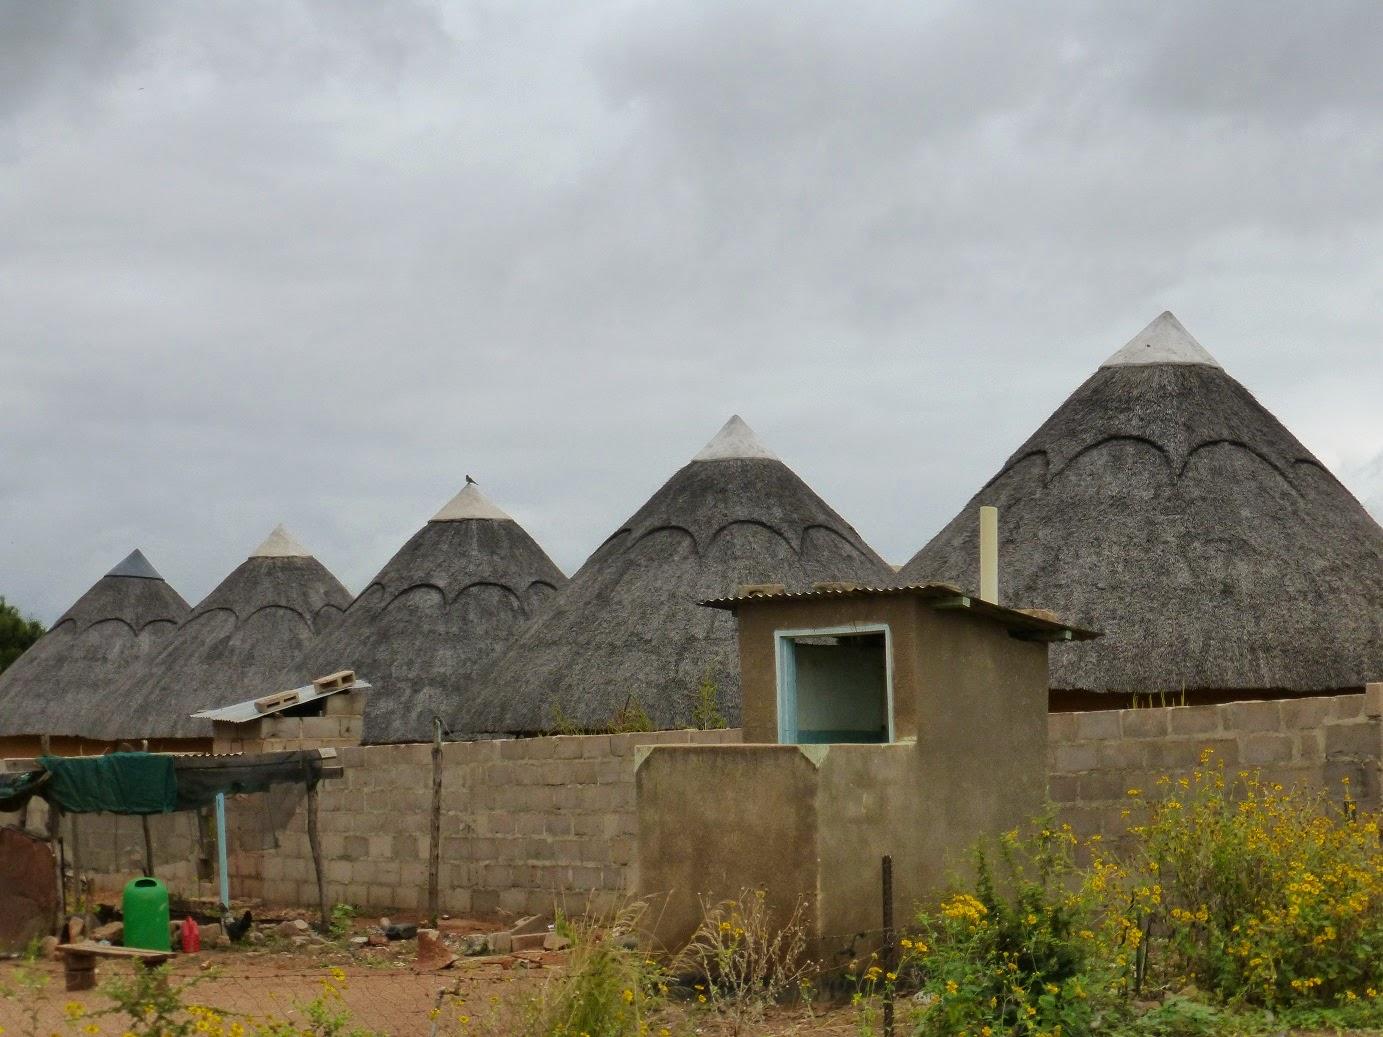 Aggers In Botswana April 2014